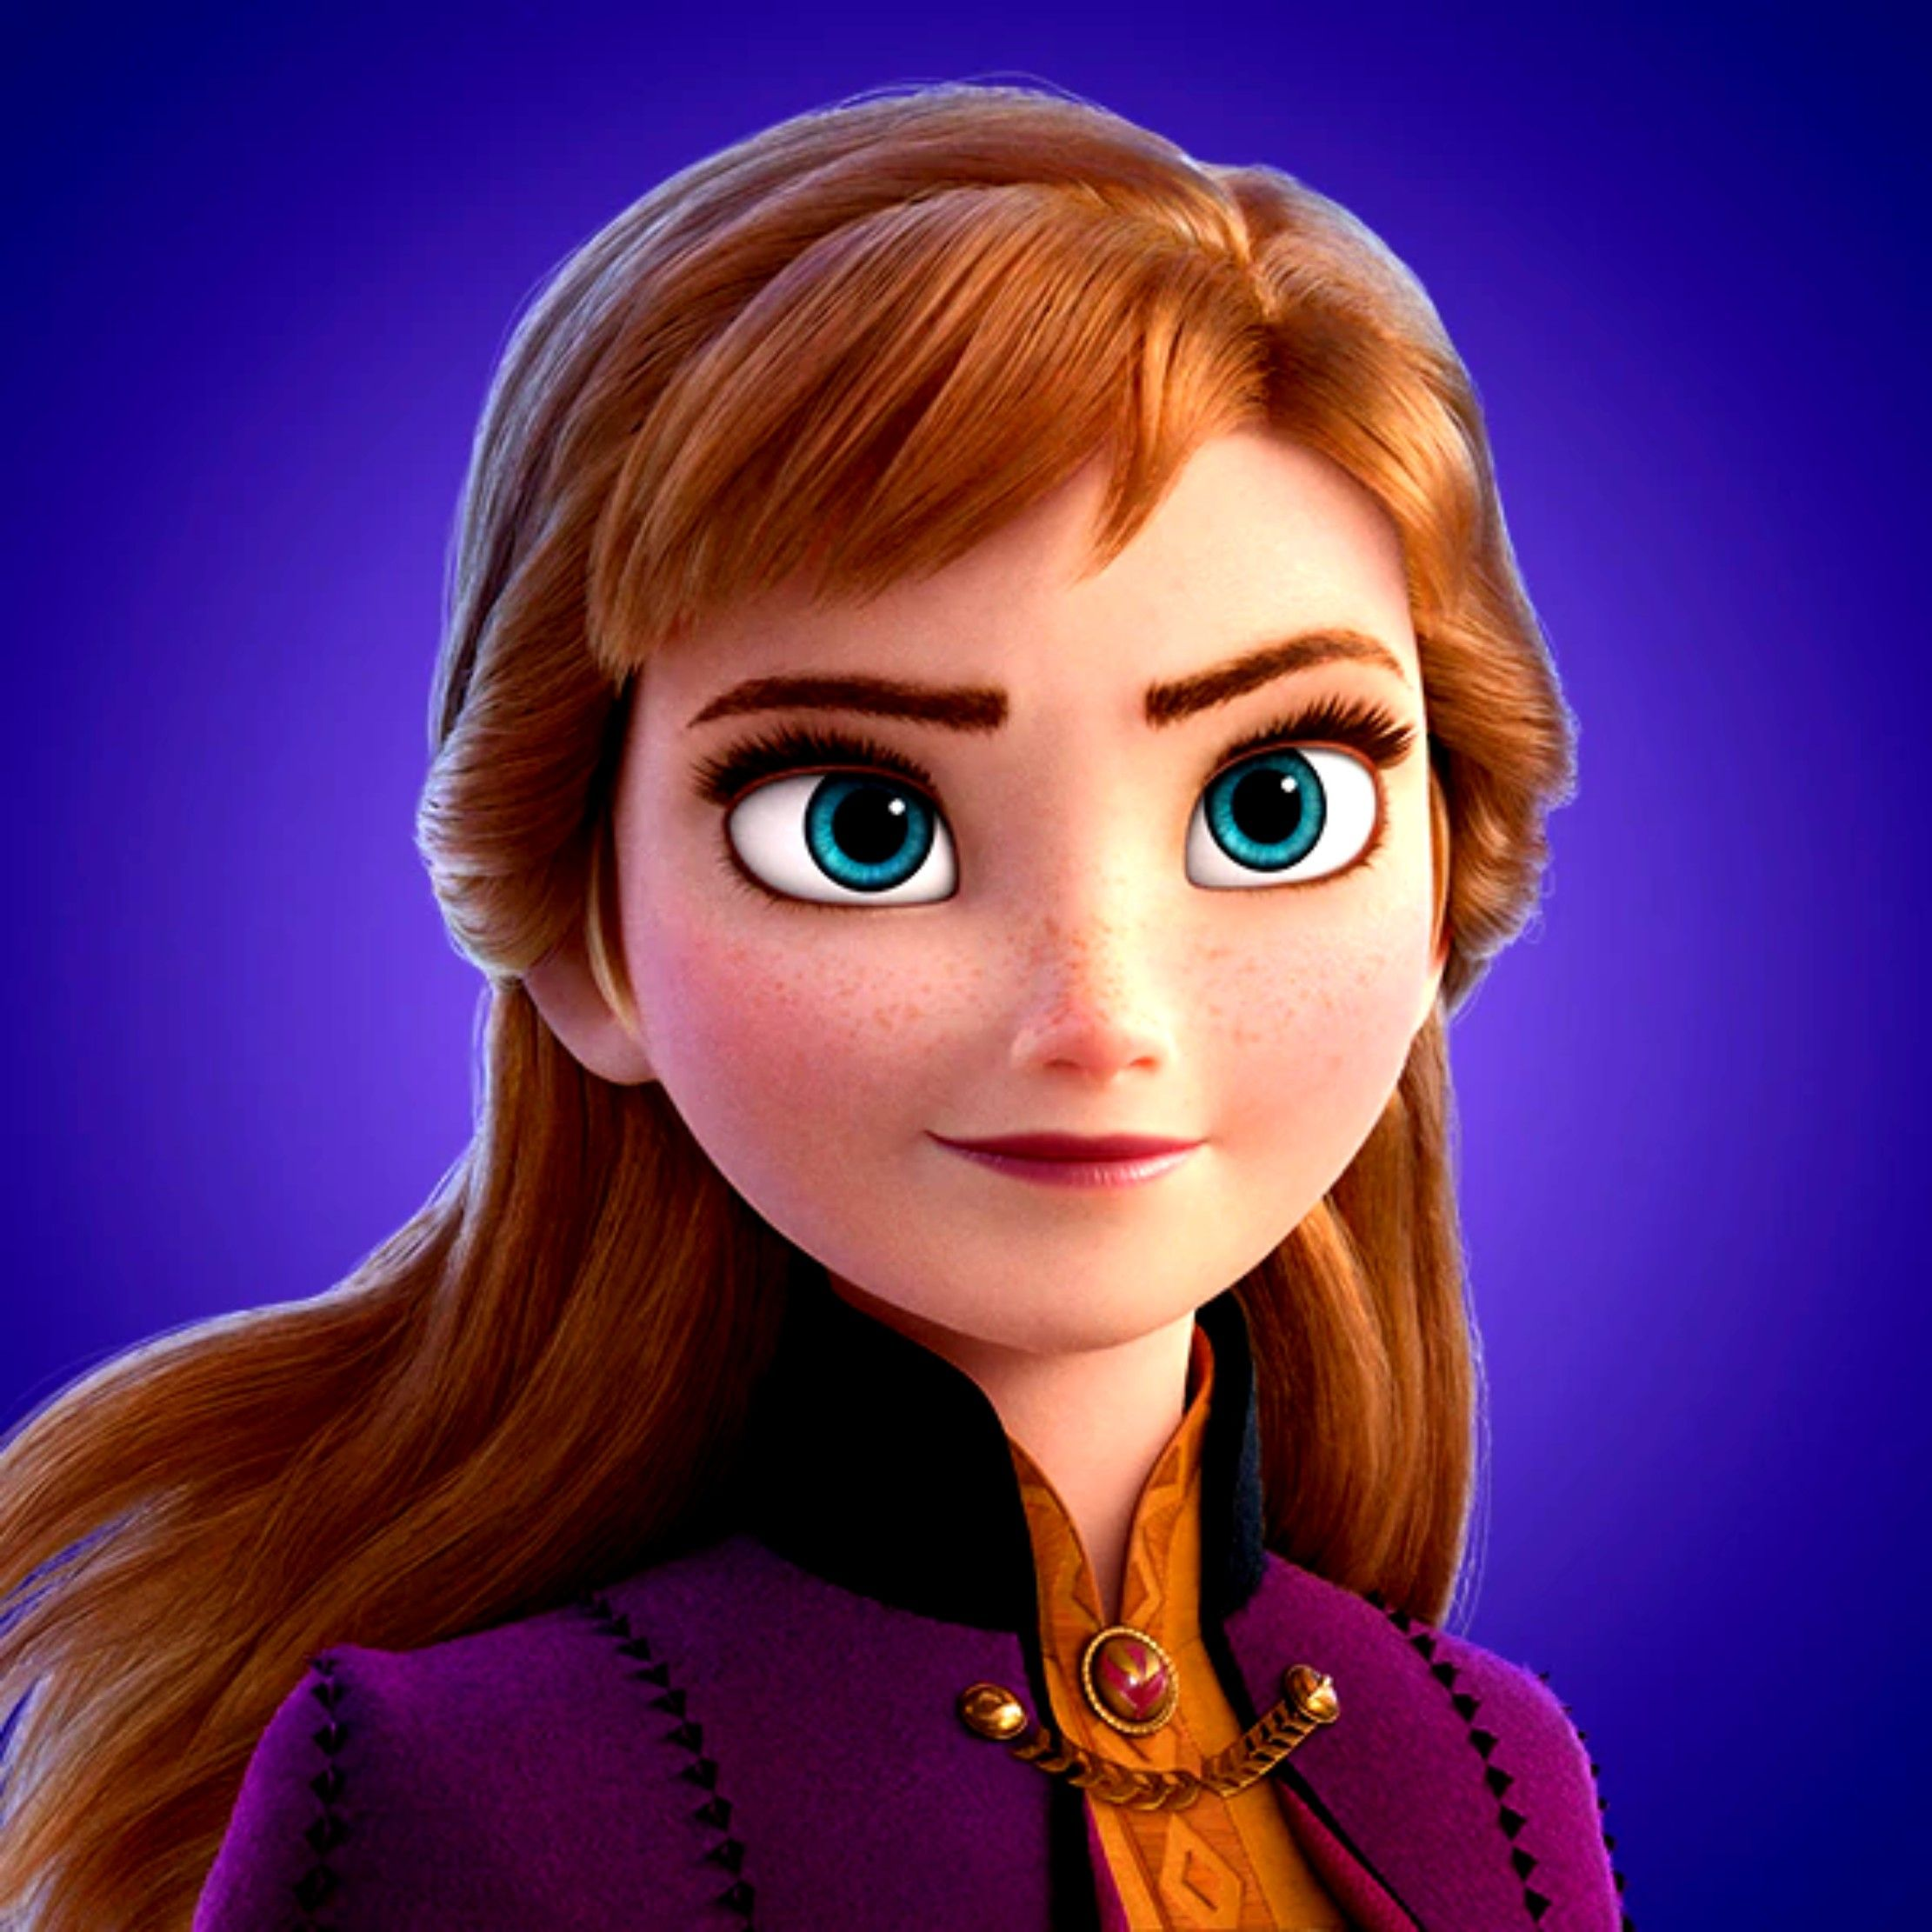 Frozen Ii 2019 In 2020 Disney Frozen Elsa Disney Princess